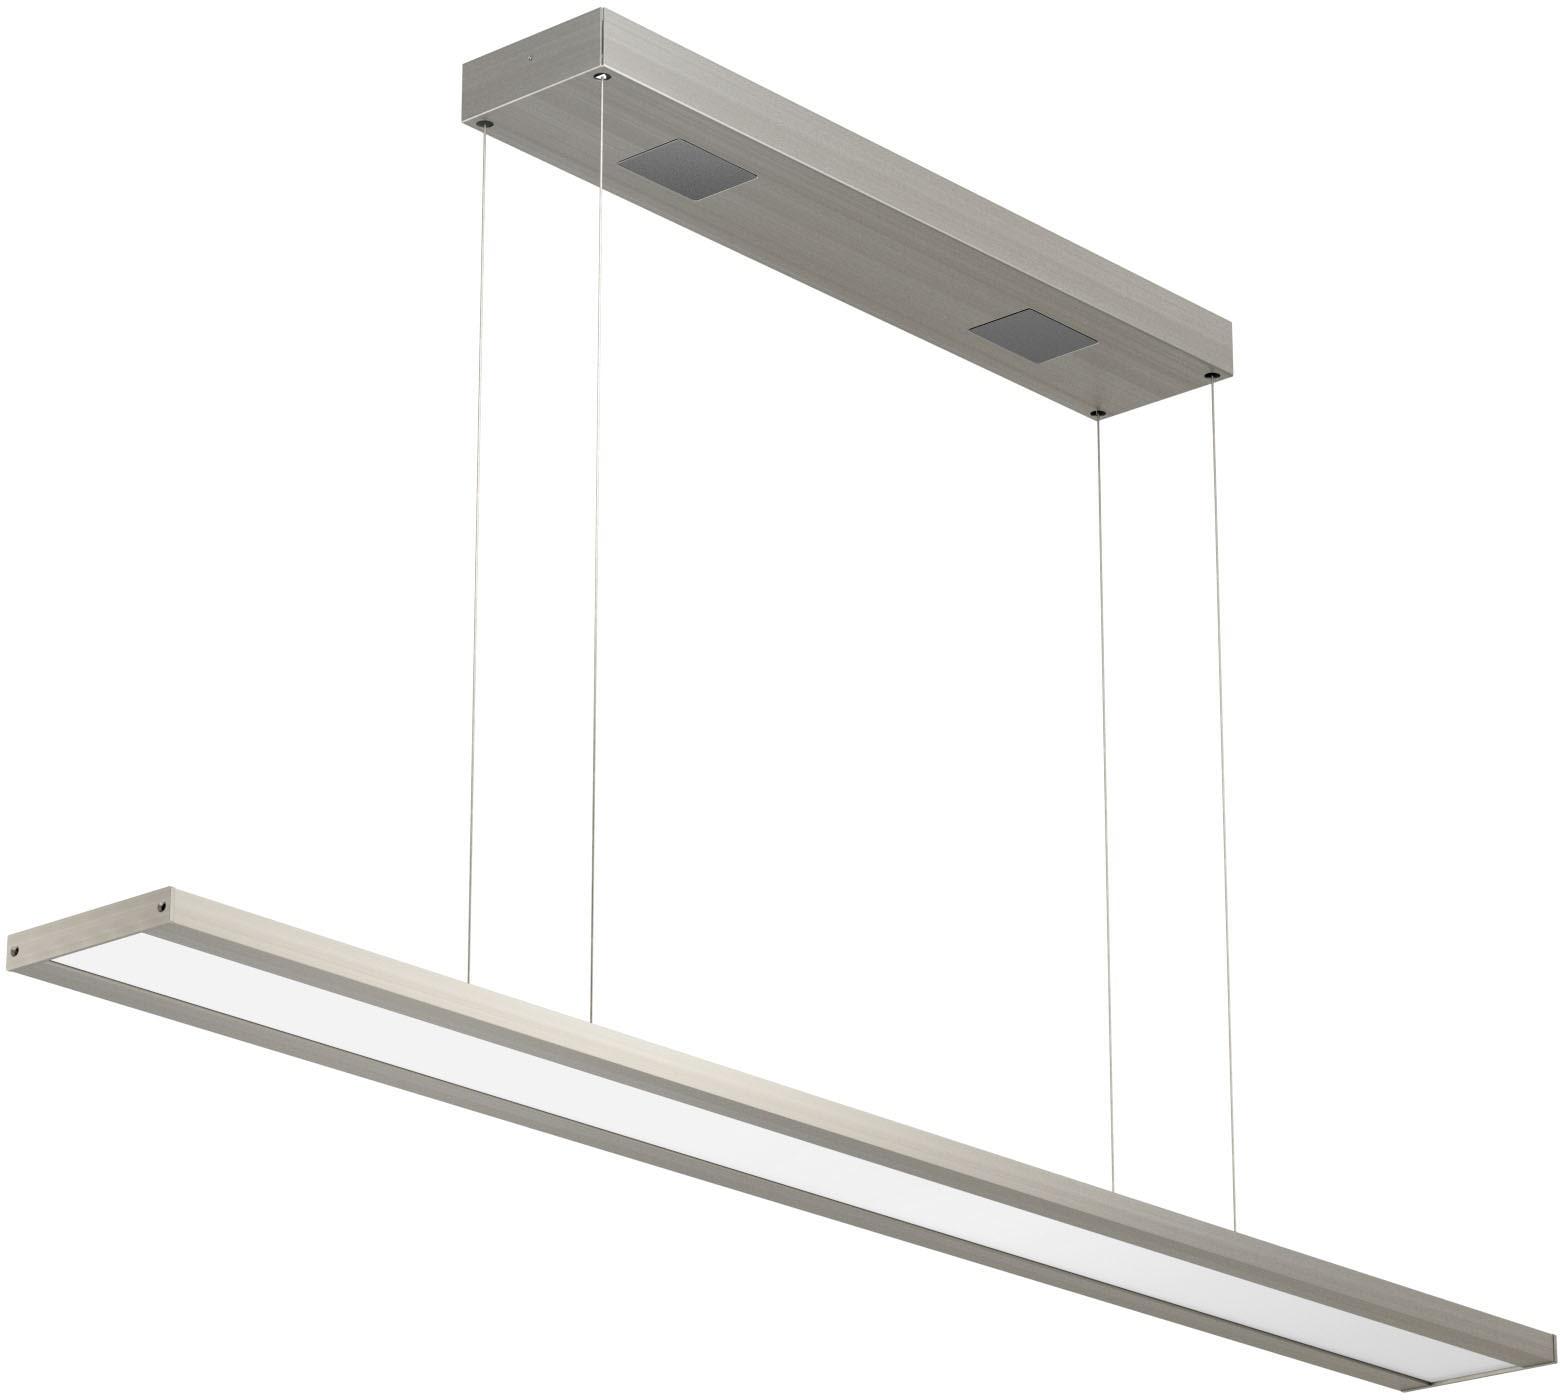 EVOTEC LED Pendelleuchte CLASSIC TEC BASIC, LED-Board, LED Hängelampe, LED Hängeleuchte, Farbwechsel